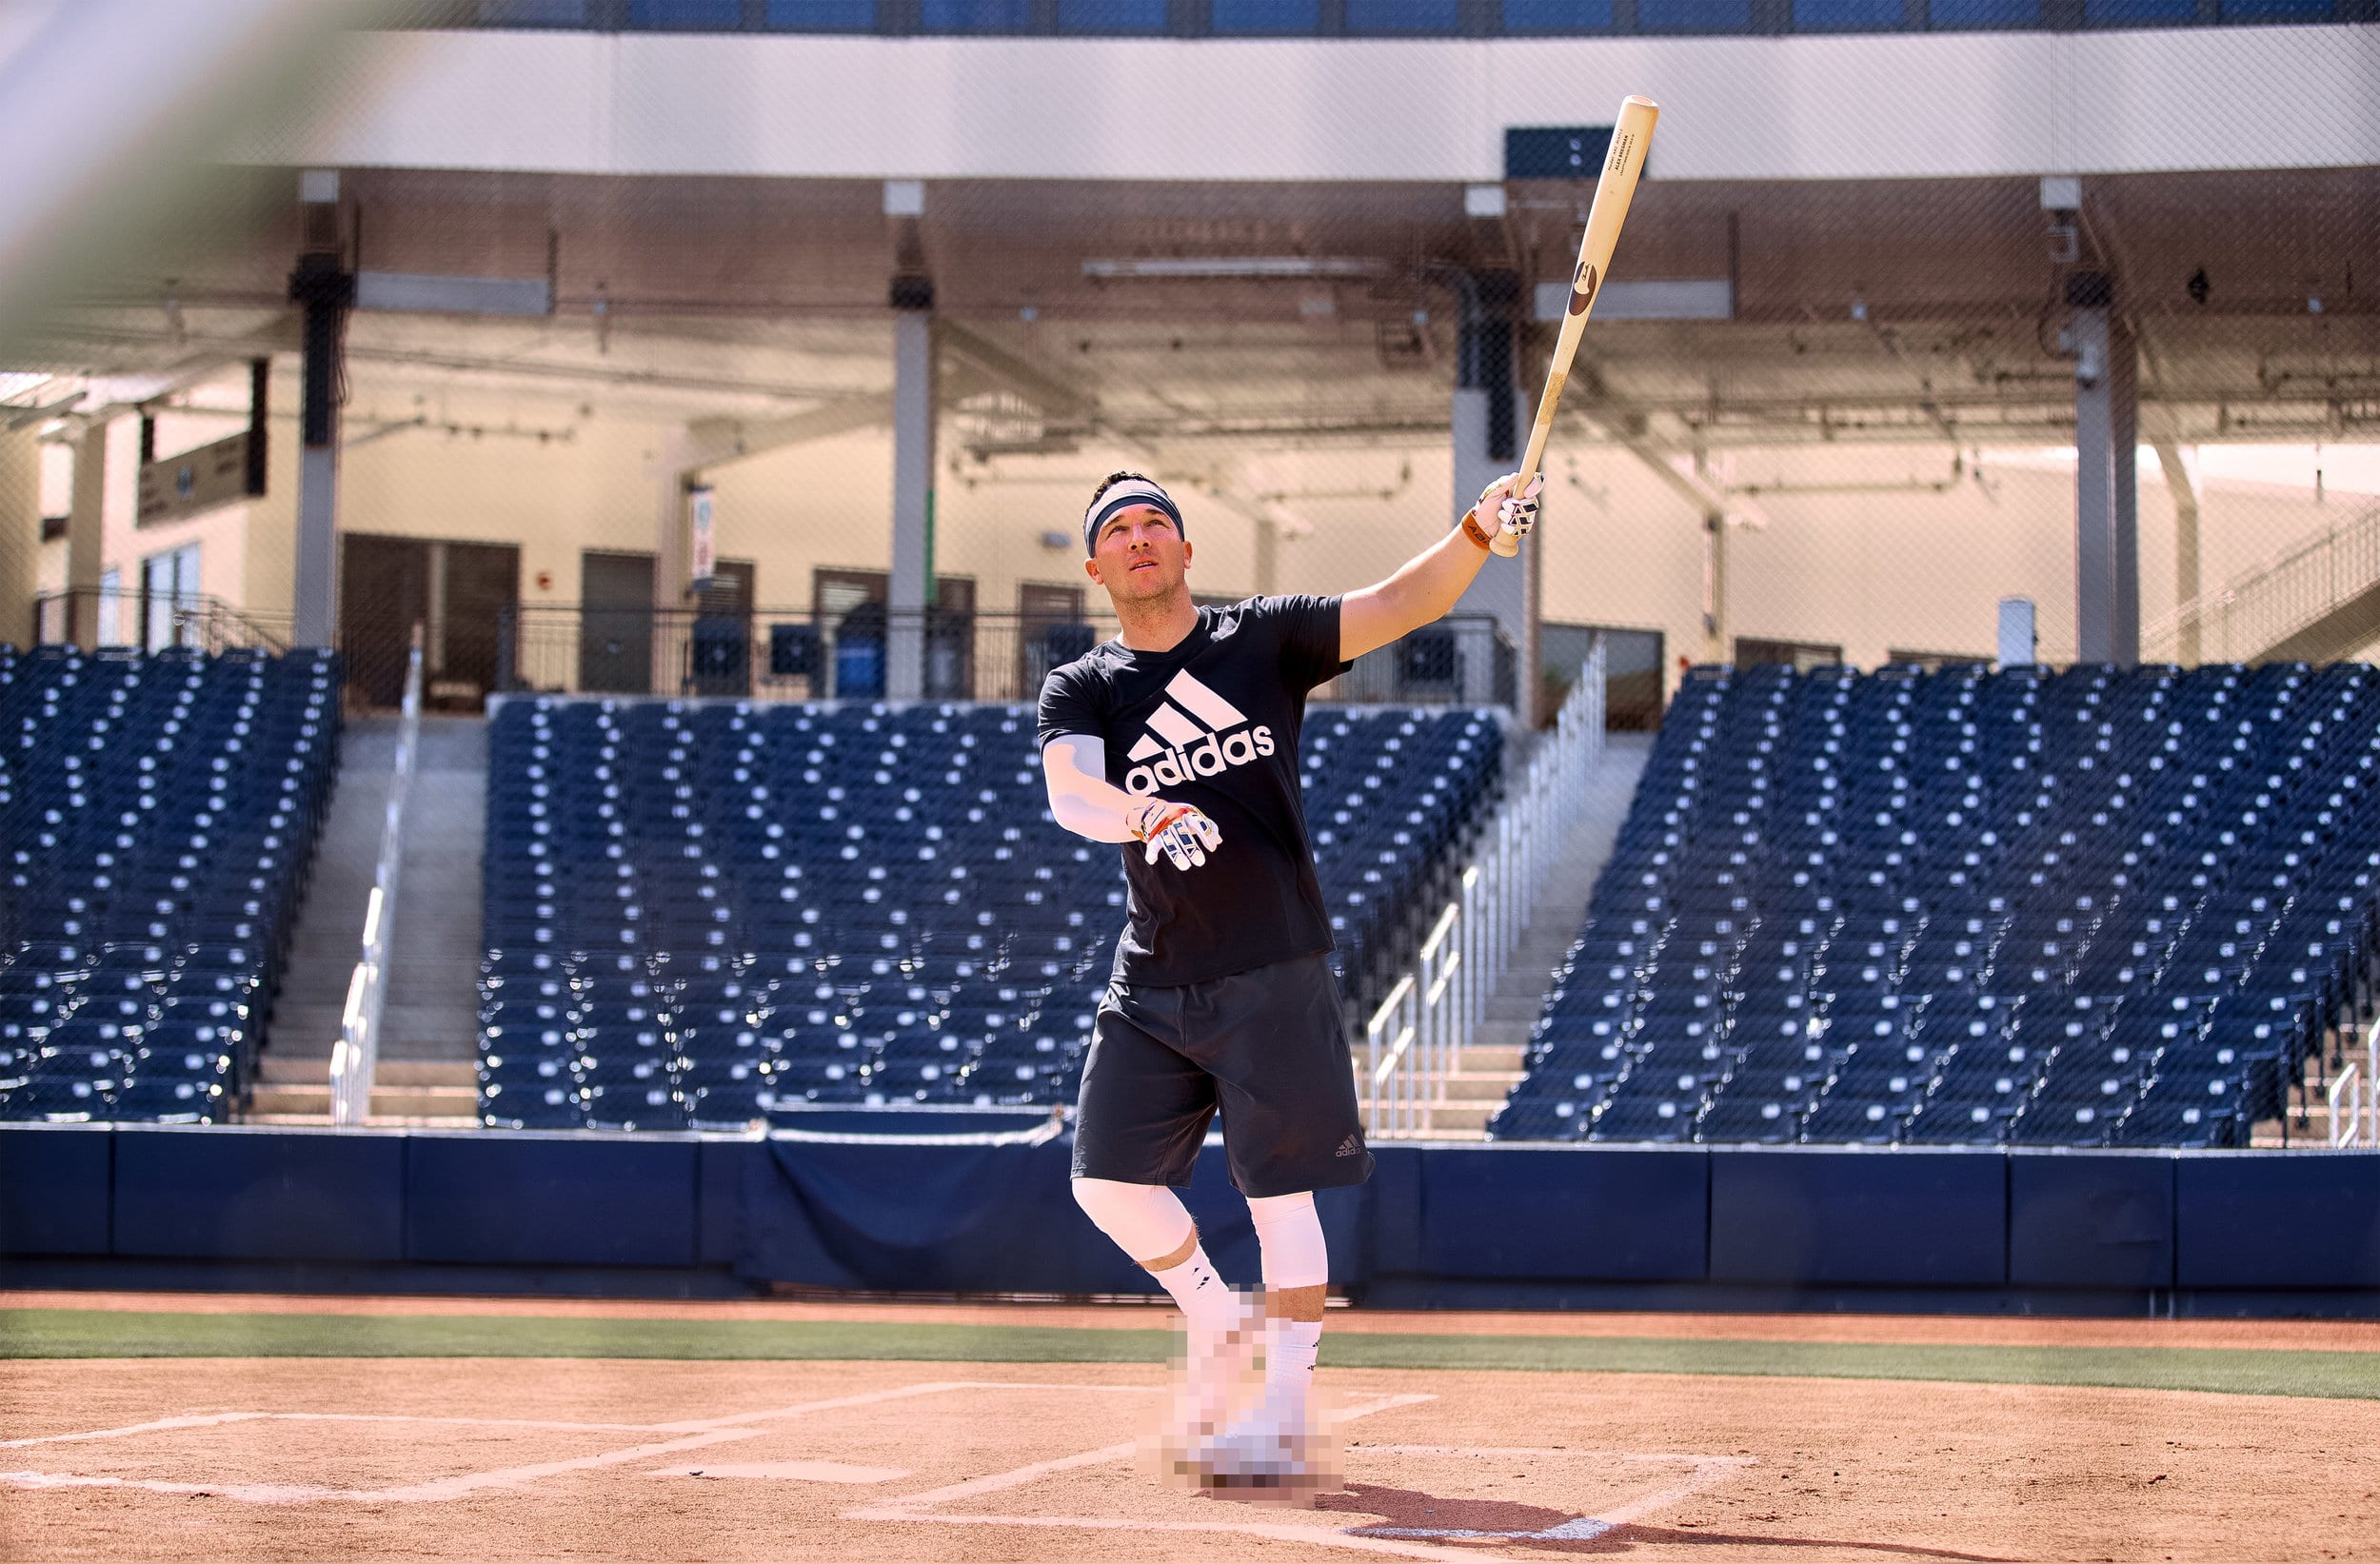 World Series Champion & MLB All-Star Alex Bregman Of The Houston Astros Joins Adidas